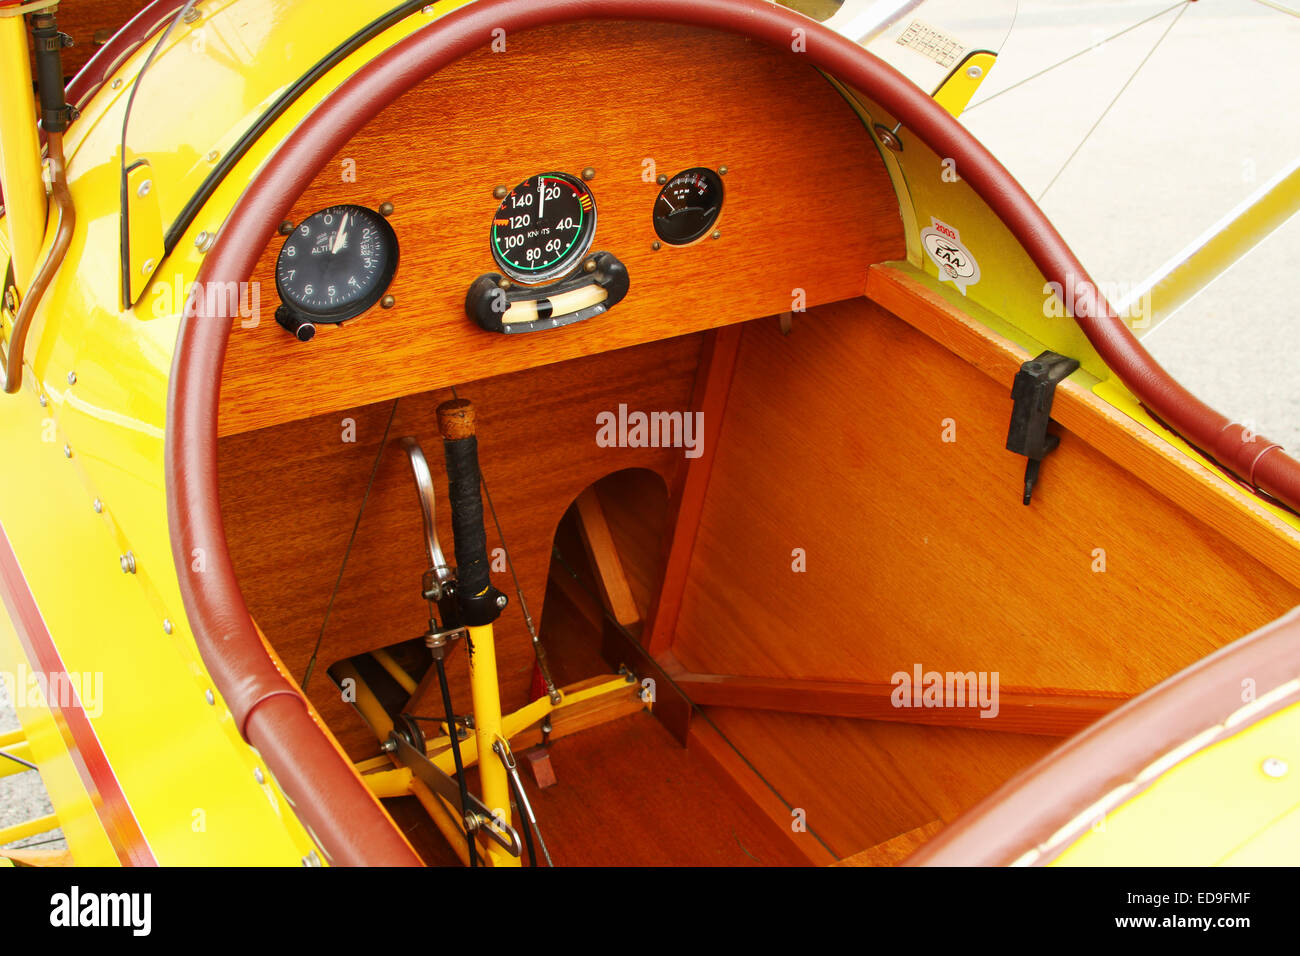 Cabina e instrumentación en un aire Pietenpol Camper. Avión amarillo. Posiblemente personalizado experimental o Foto de stock